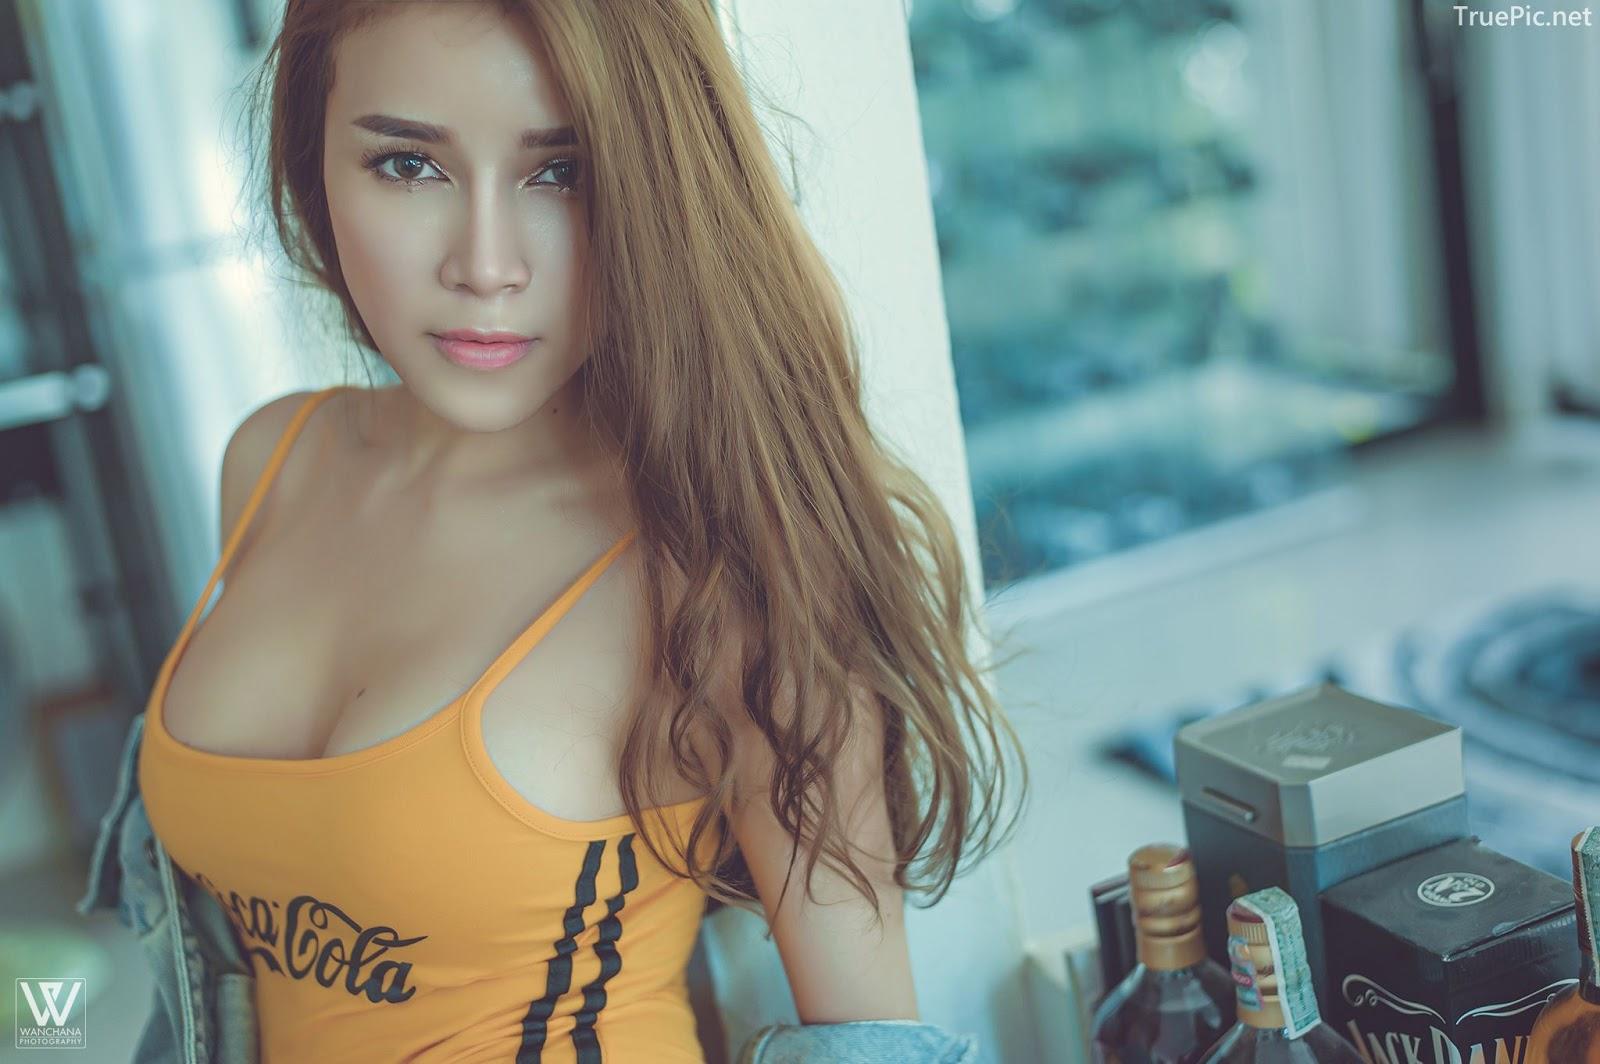 Thailand Sexy Model - Lanchakorn Yeunyaw - Yellow Coca Colas - TruePic.net - Picture 4